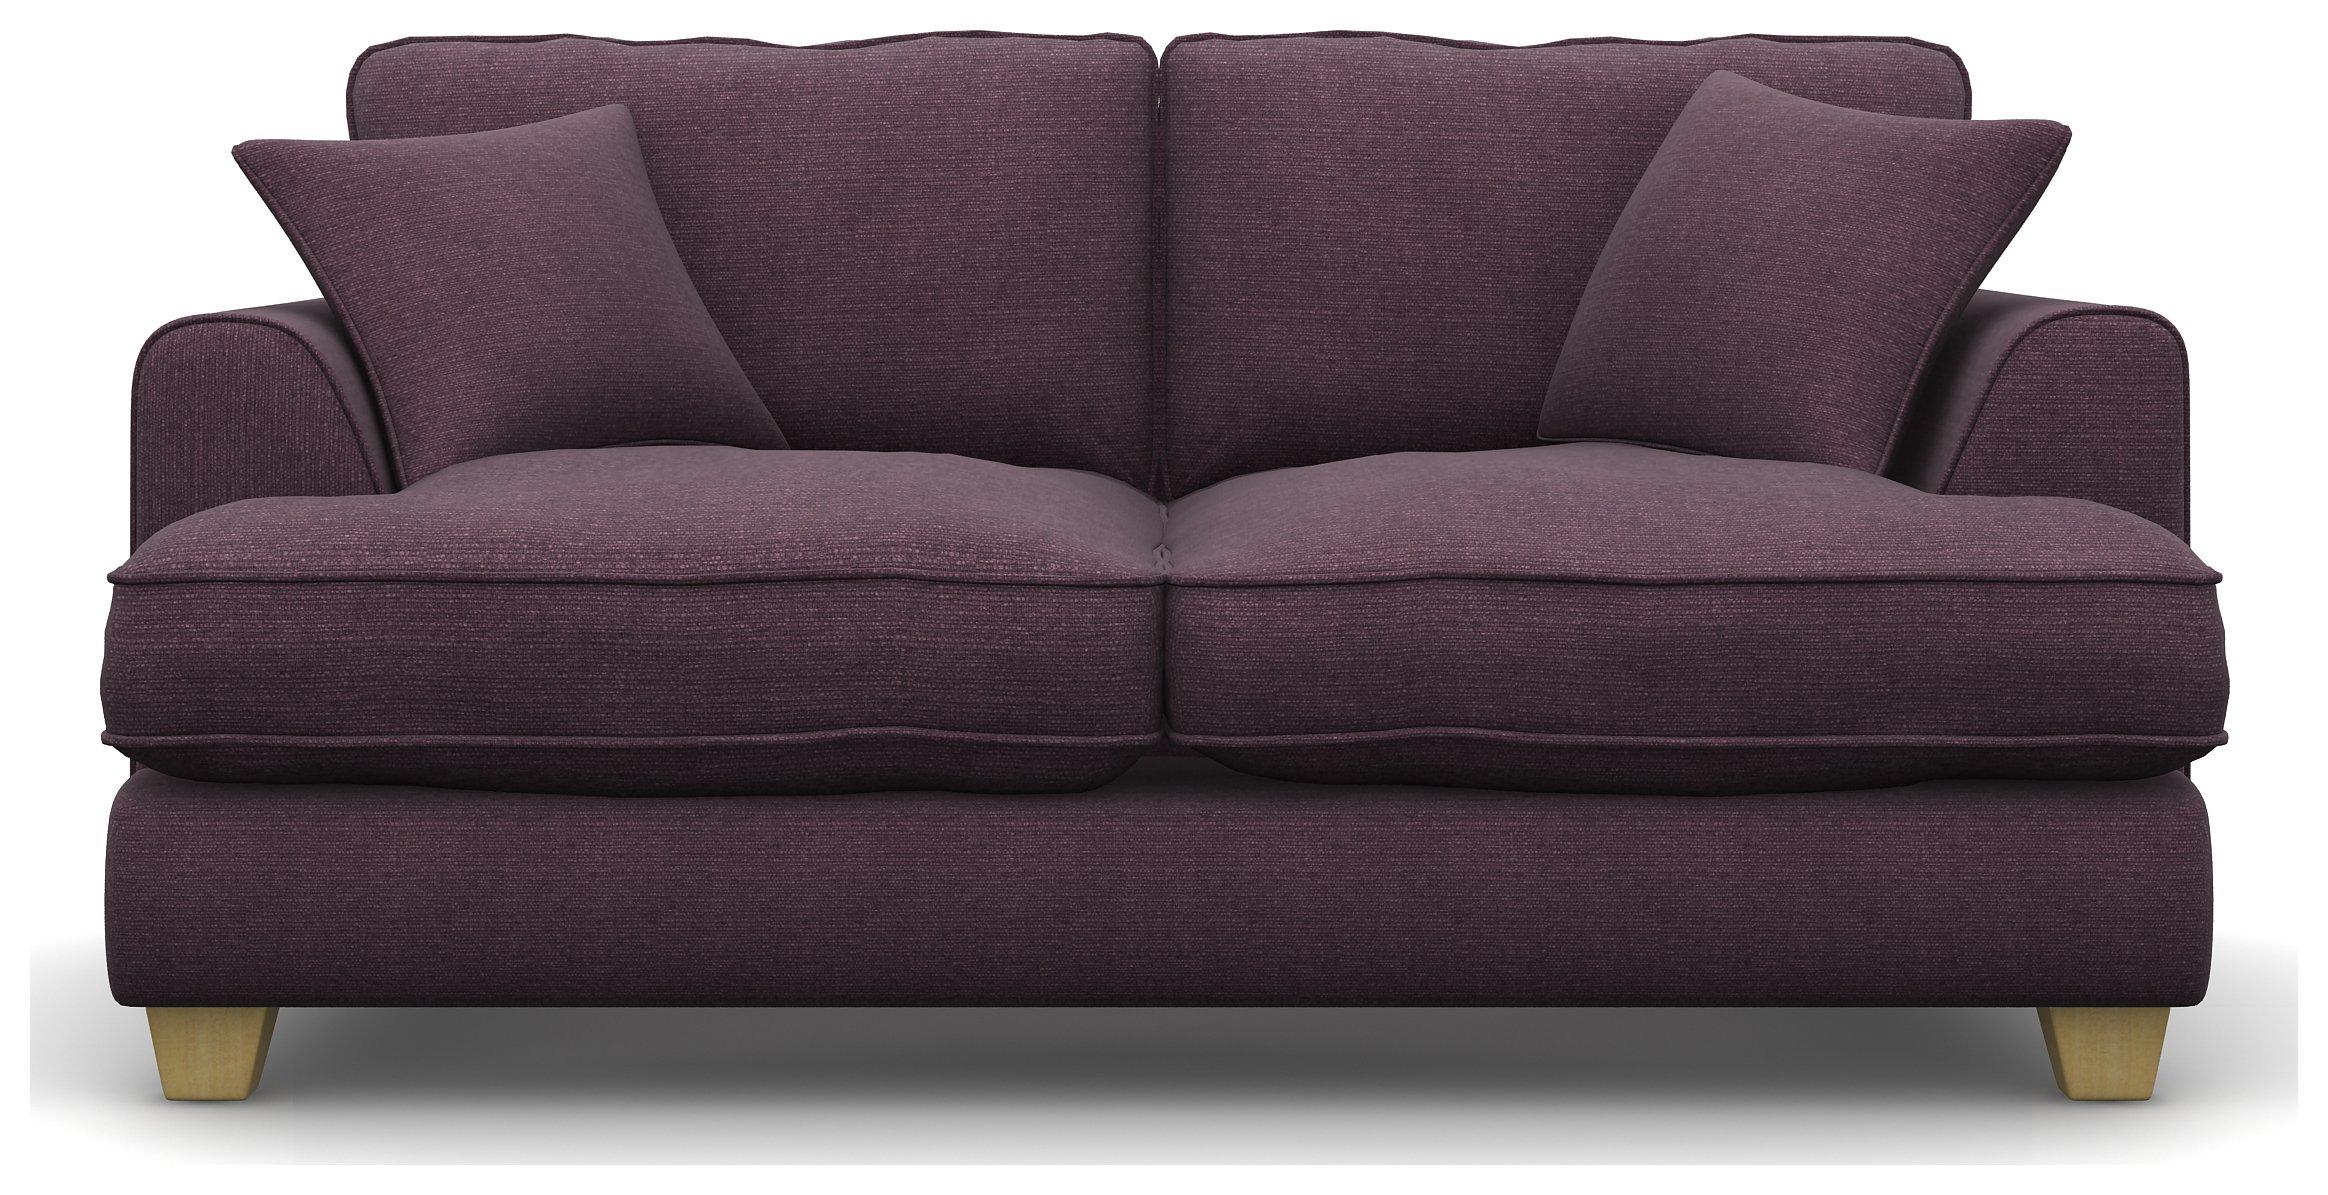 Heart of House Hampstead 2 Seater Fabric Sofa - Mushroom.